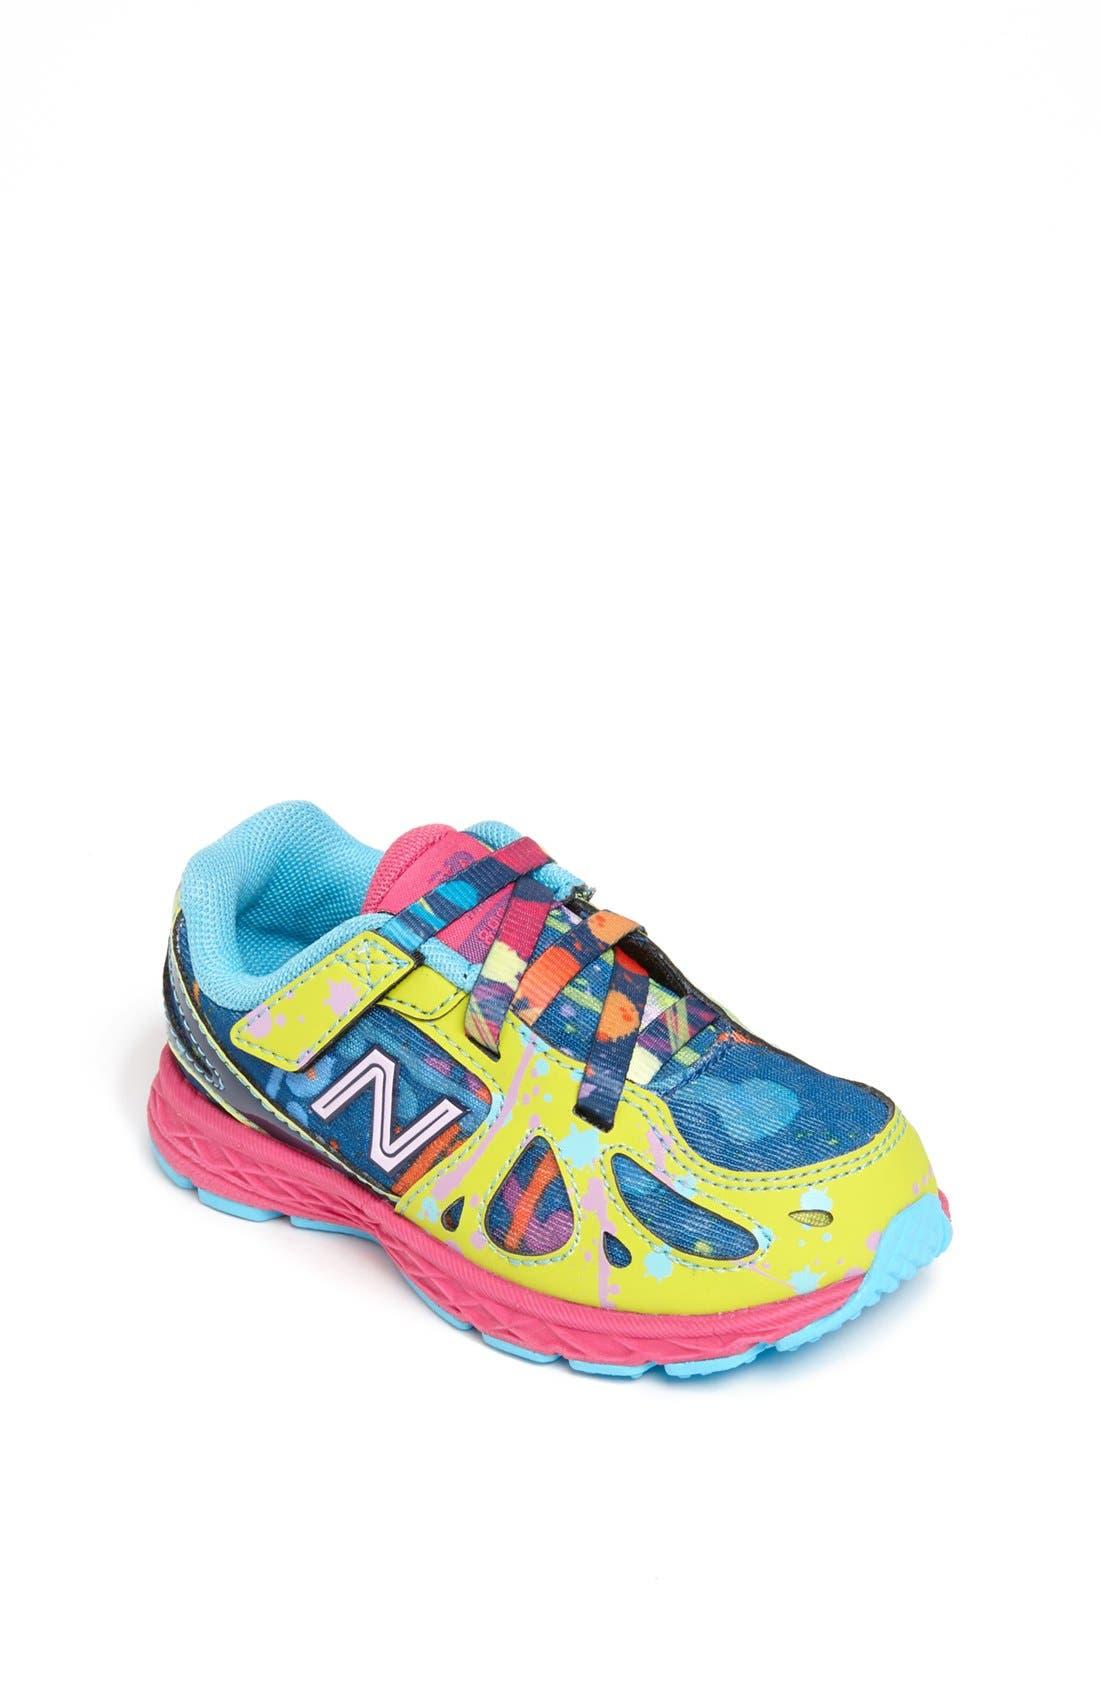 Main Image - New Balance '890 Alpha' Sneaker (Baby, Walker & Toddler)